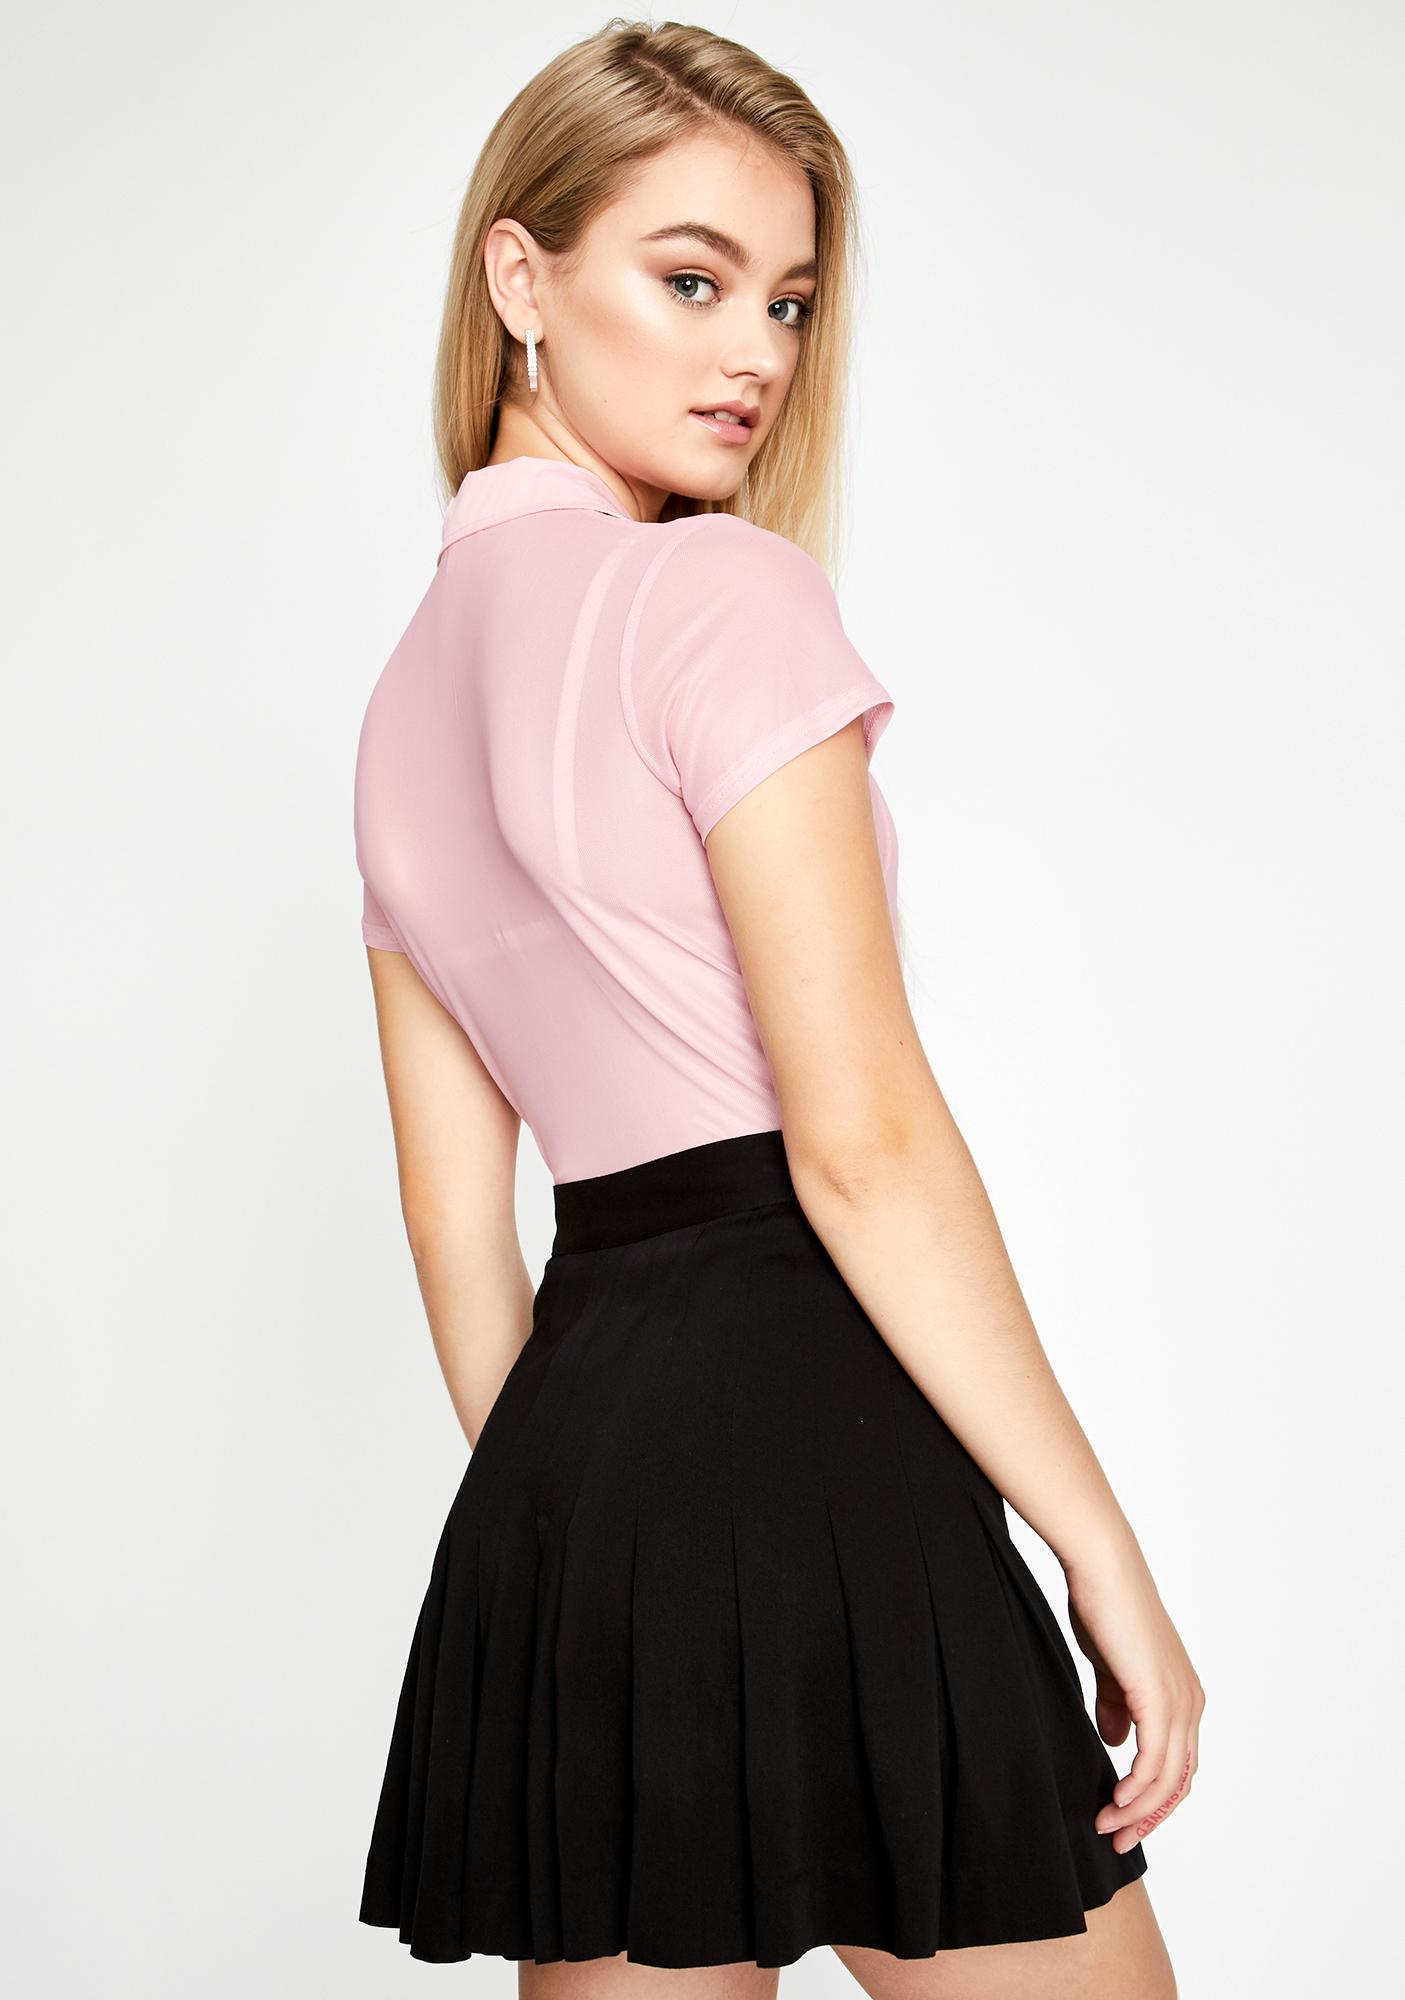 Sugar Thrillz A-Plus Preppie Mini Skirt